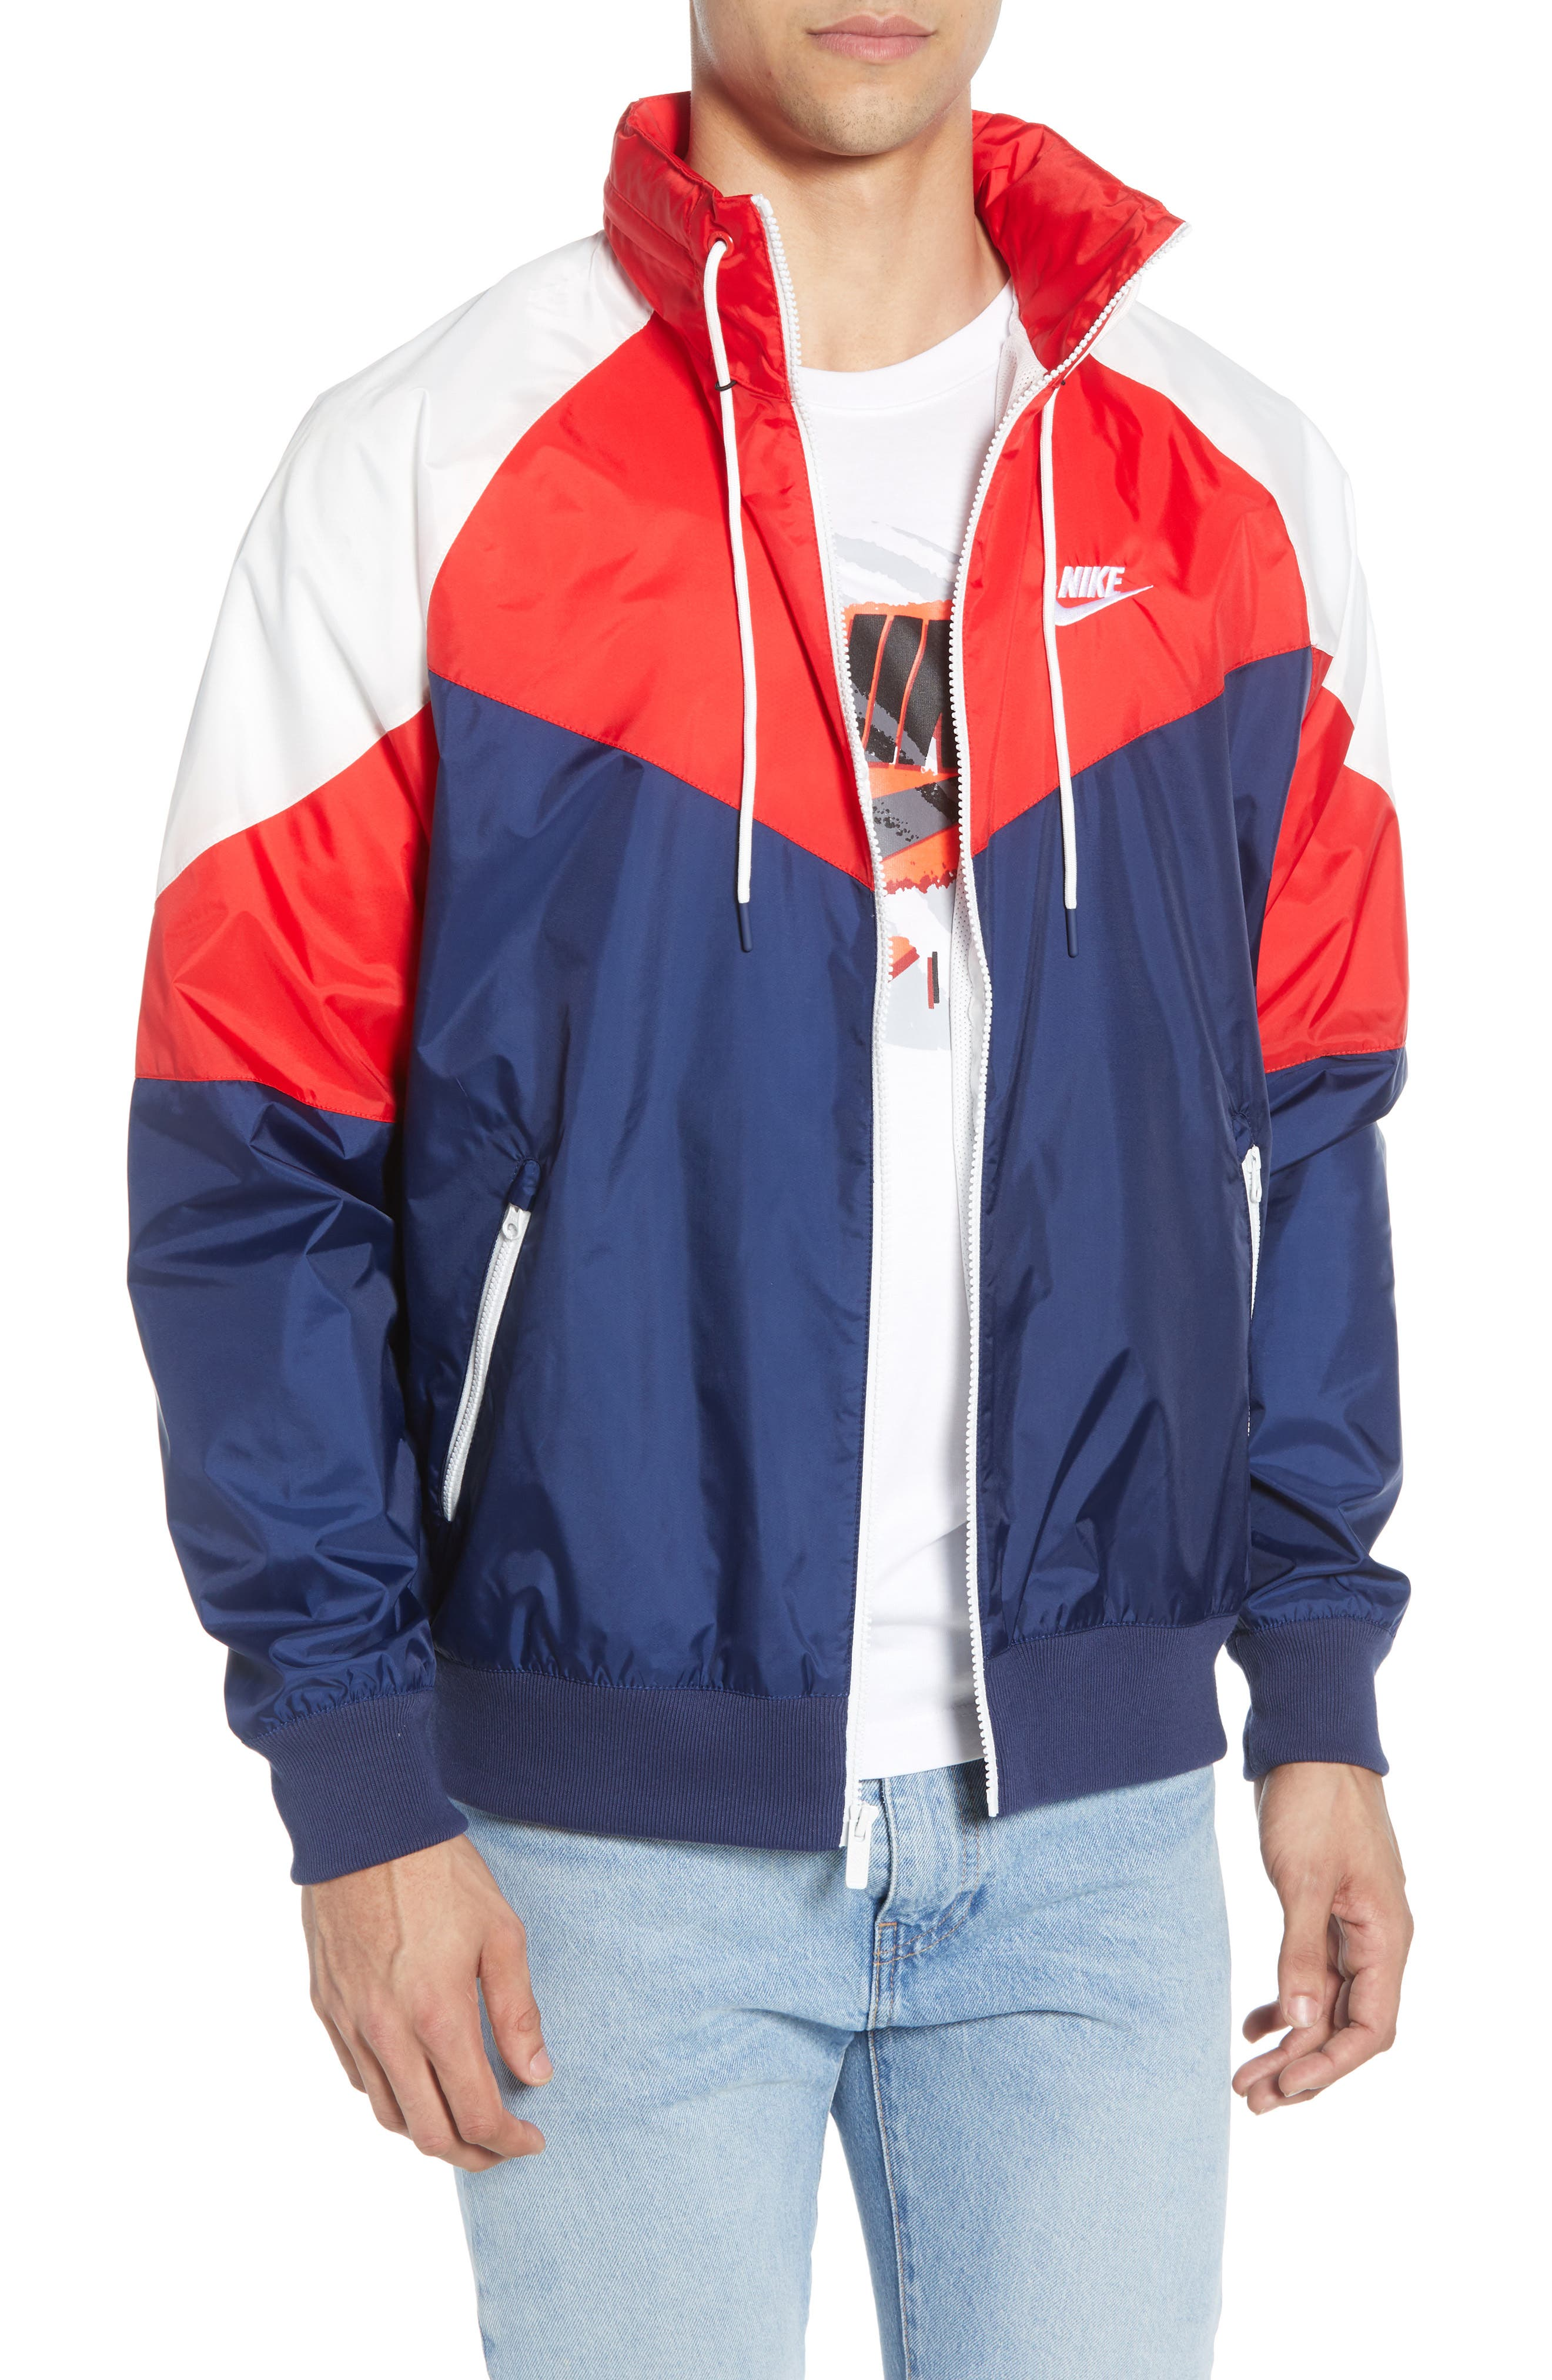 Men's Nike Coats & Jackets | Nordstrom